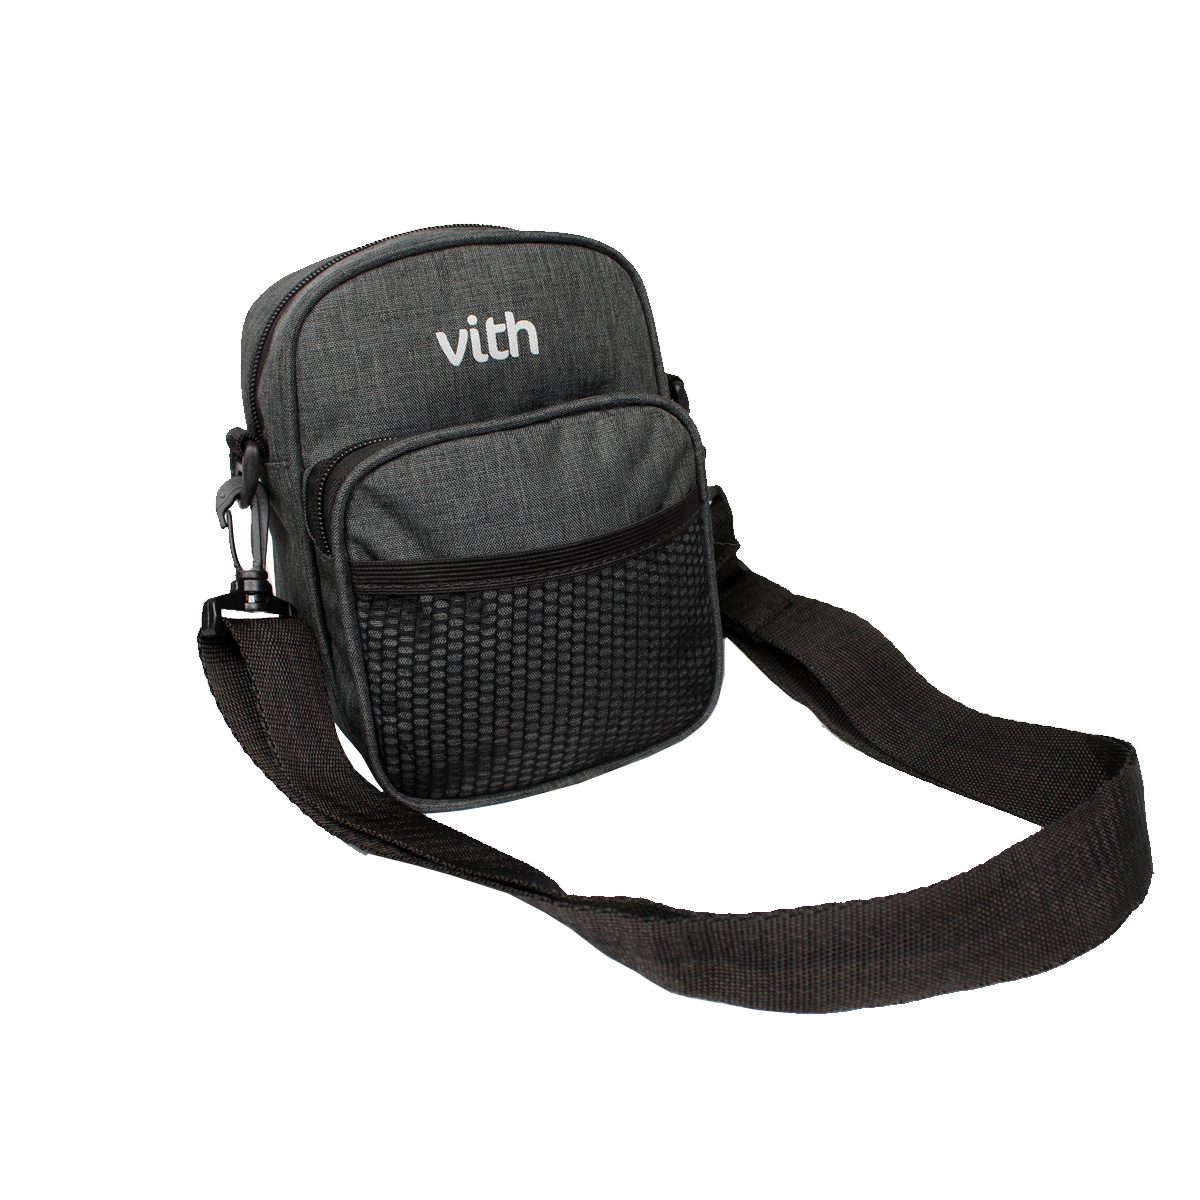 Bolsa Transversal Shoulder Bag Vith - Necessaire Essentials Unissex - Bag Lev